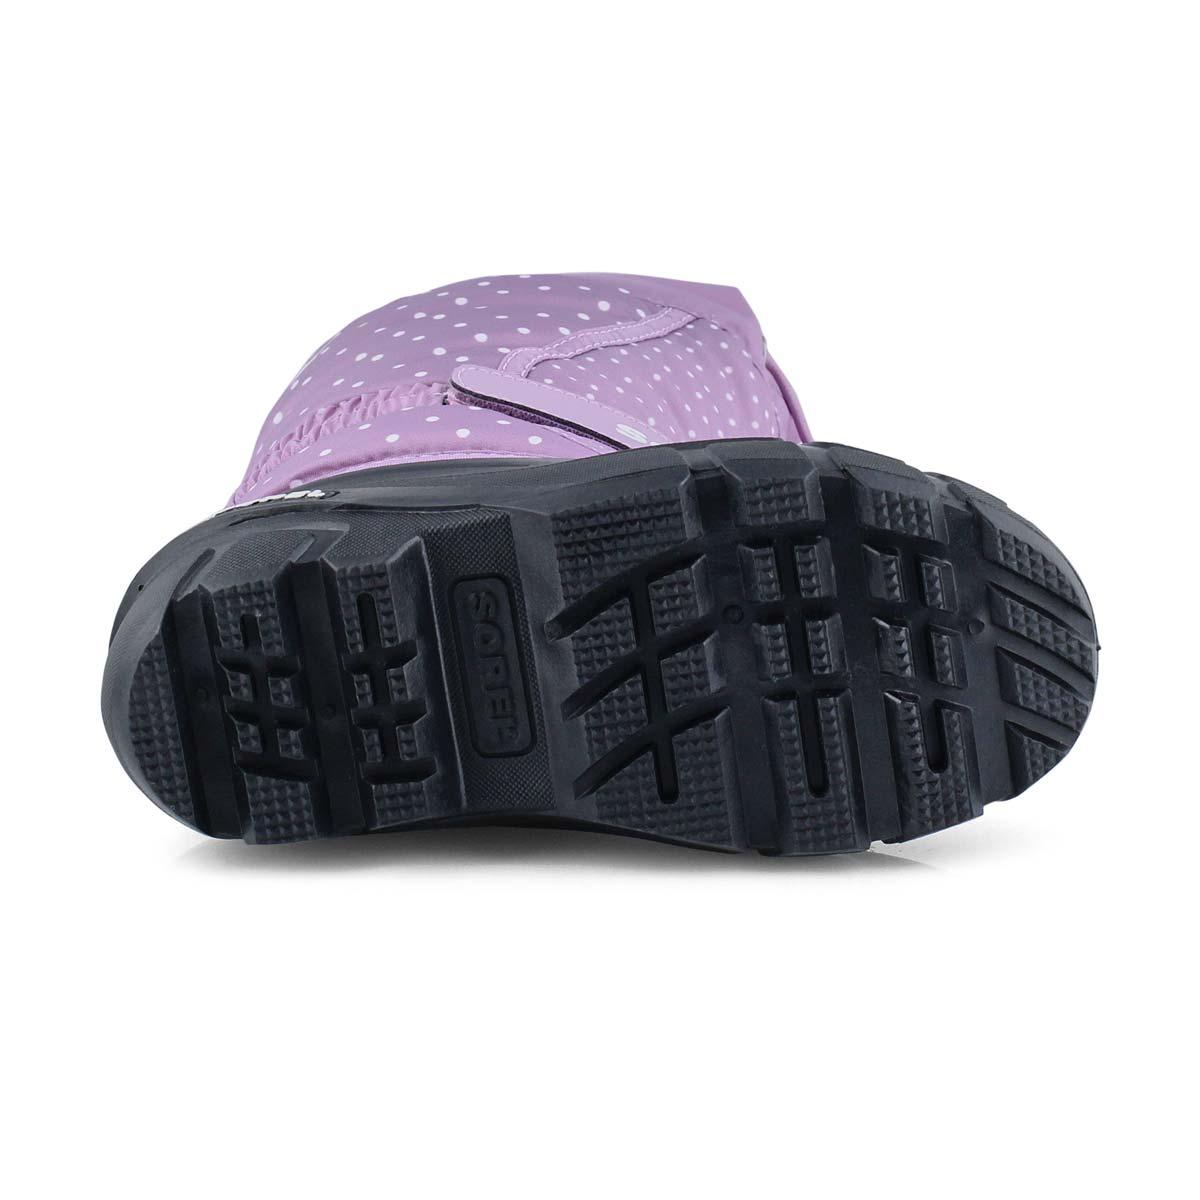 Grls Flurry purple pull on winter boot